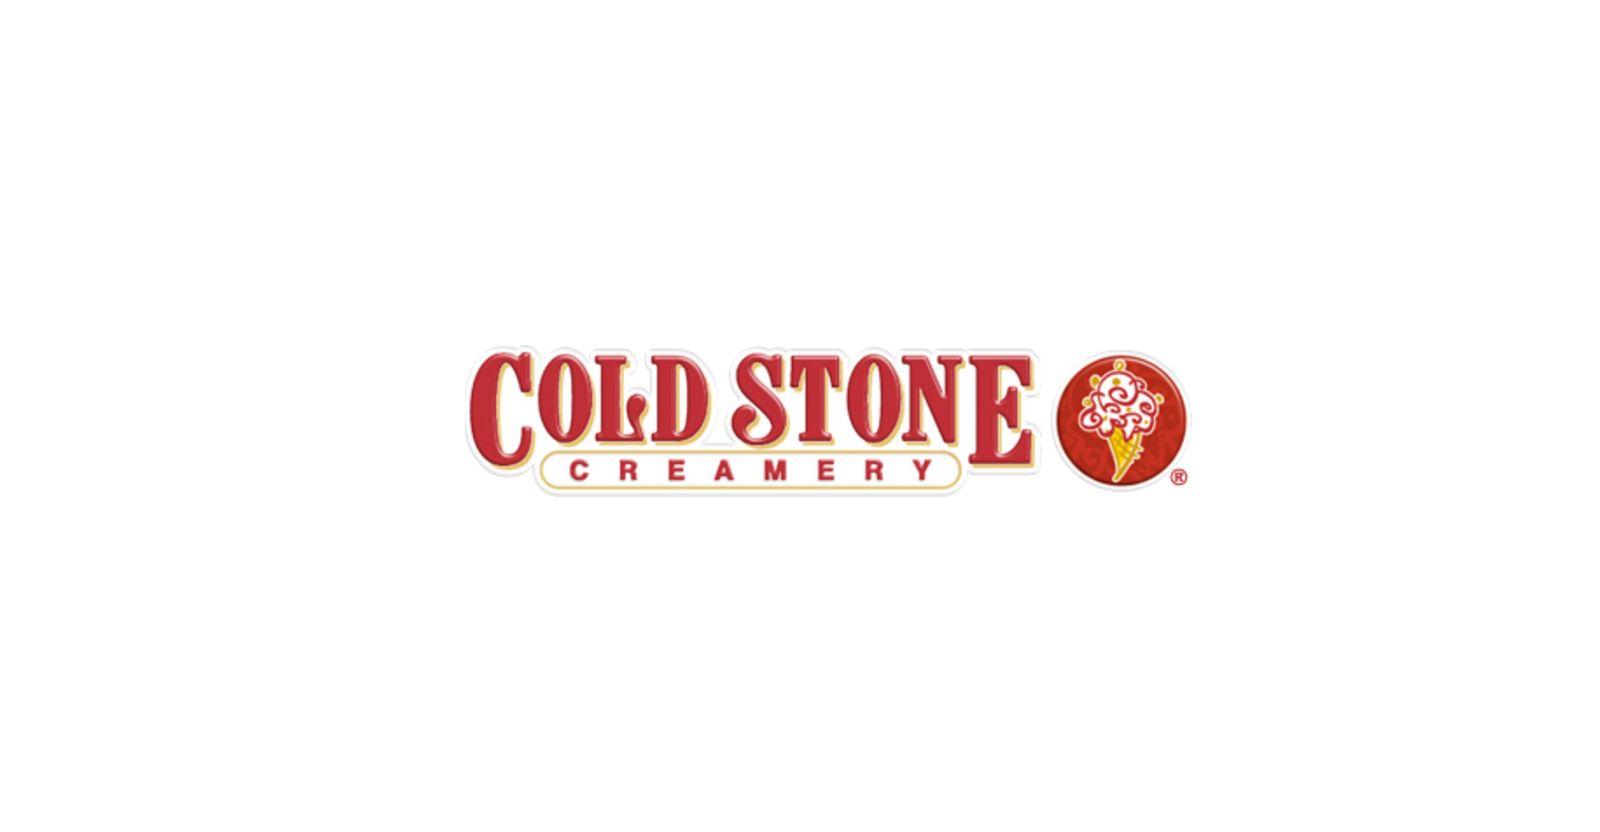 Cold stone creamery glutenfree menu 2020 no gluten